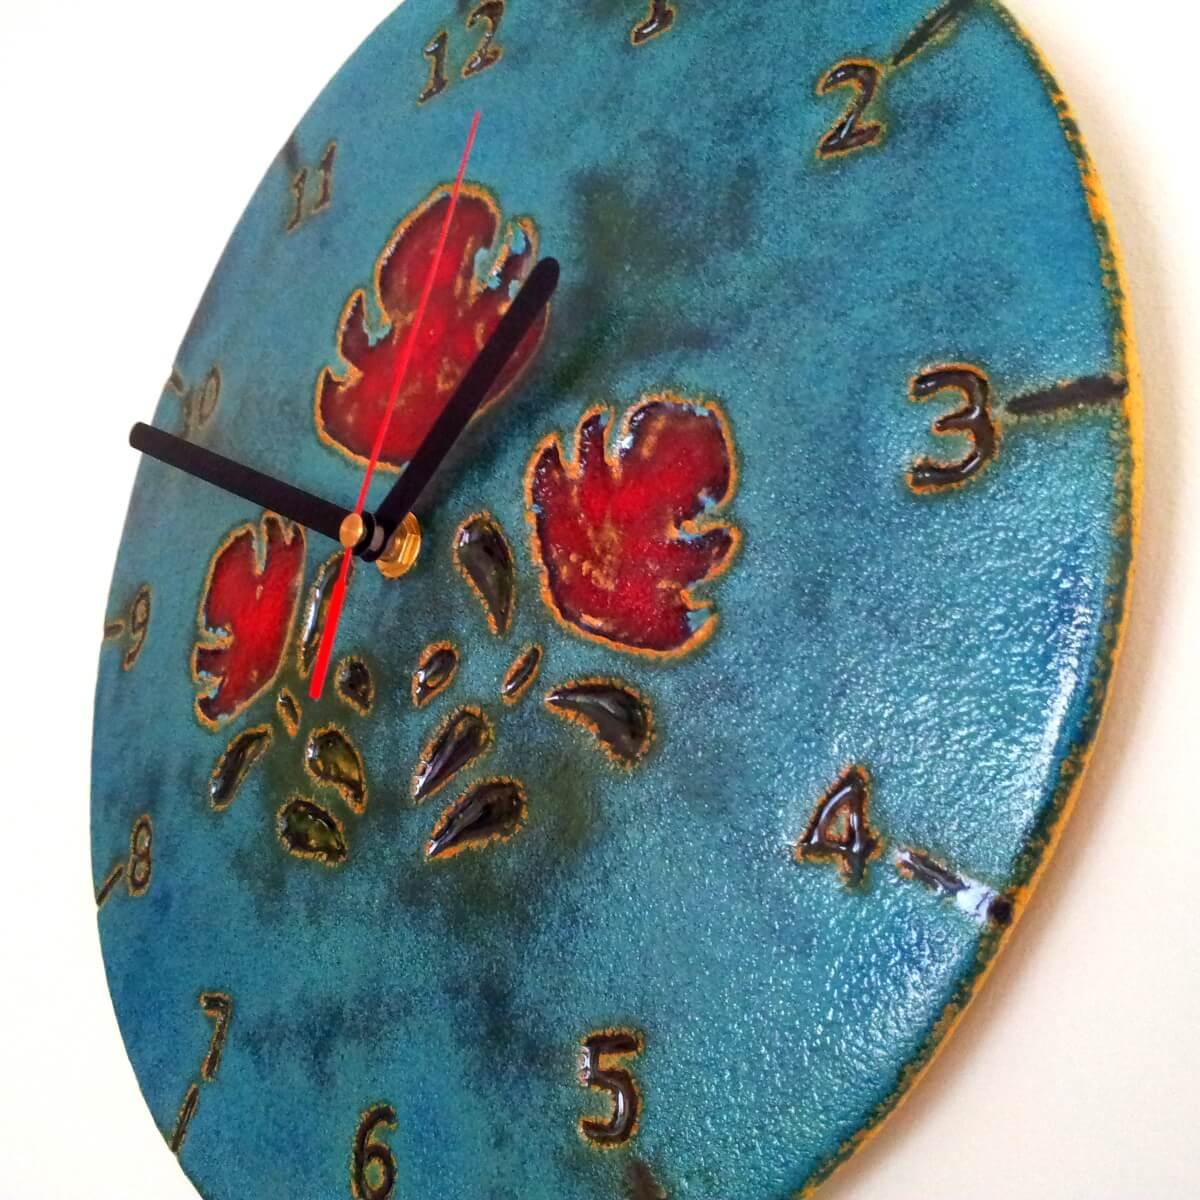 ludowy zegar